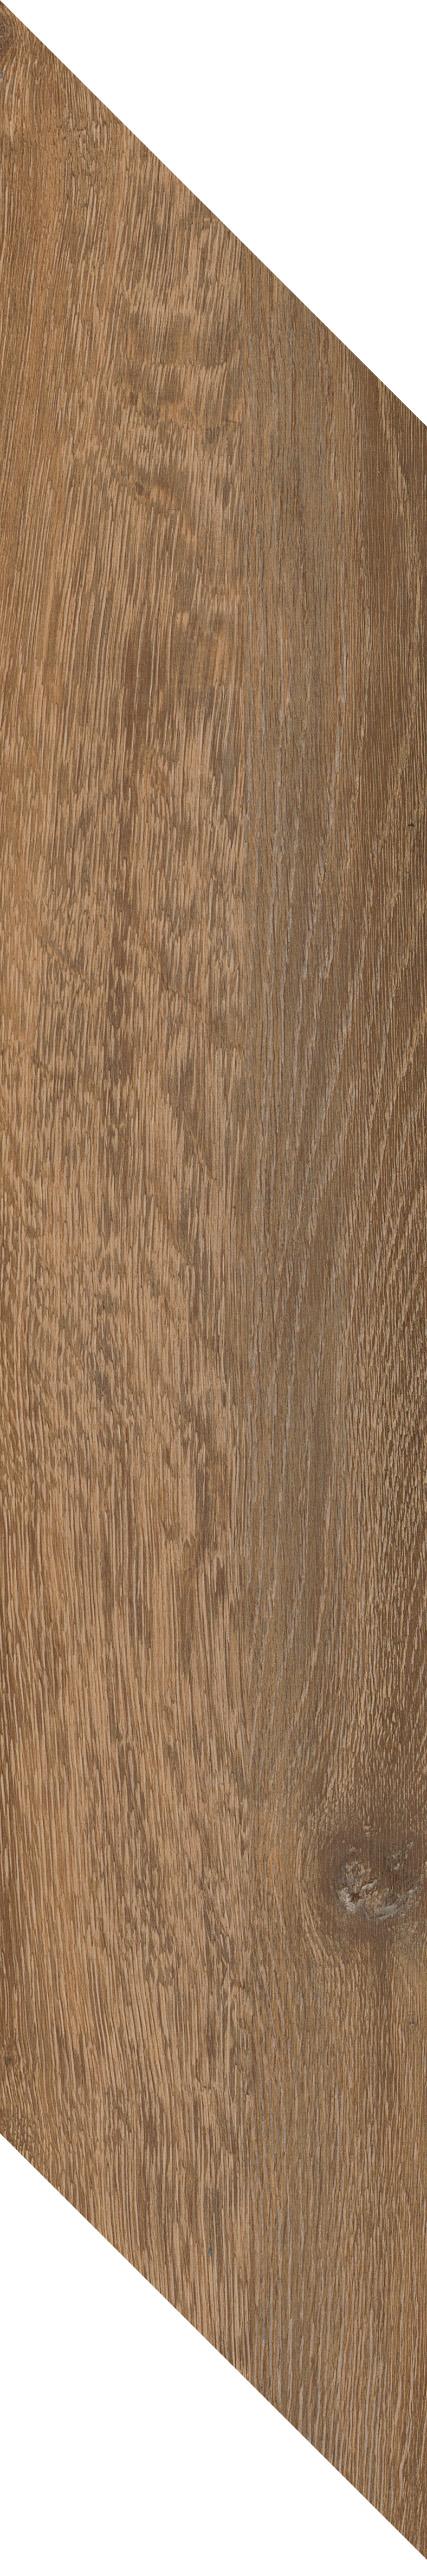 Parva Oak Chevron Liguria 42216